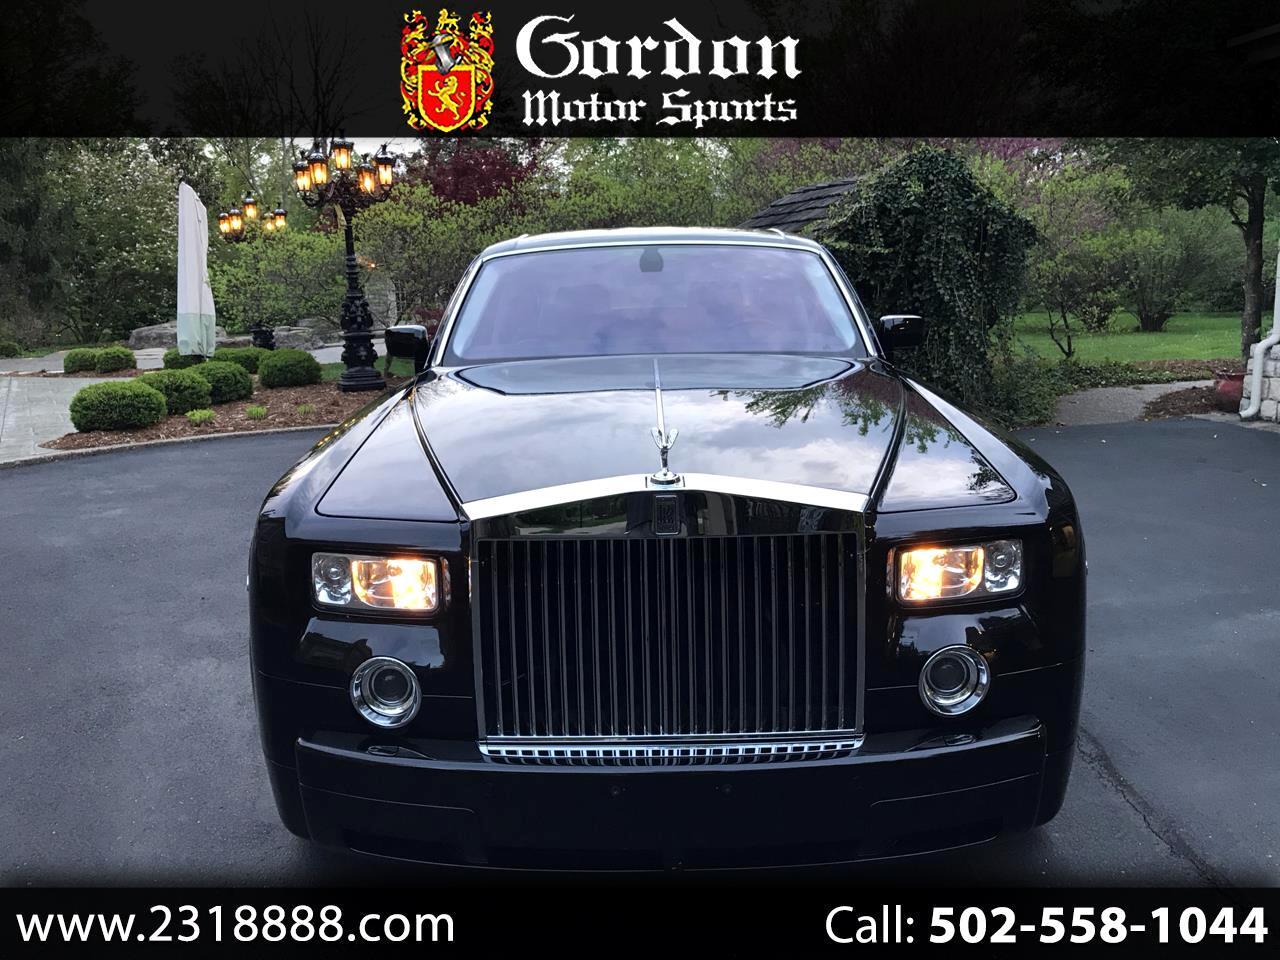 2006 Rolls-Royce Phantom Sedan